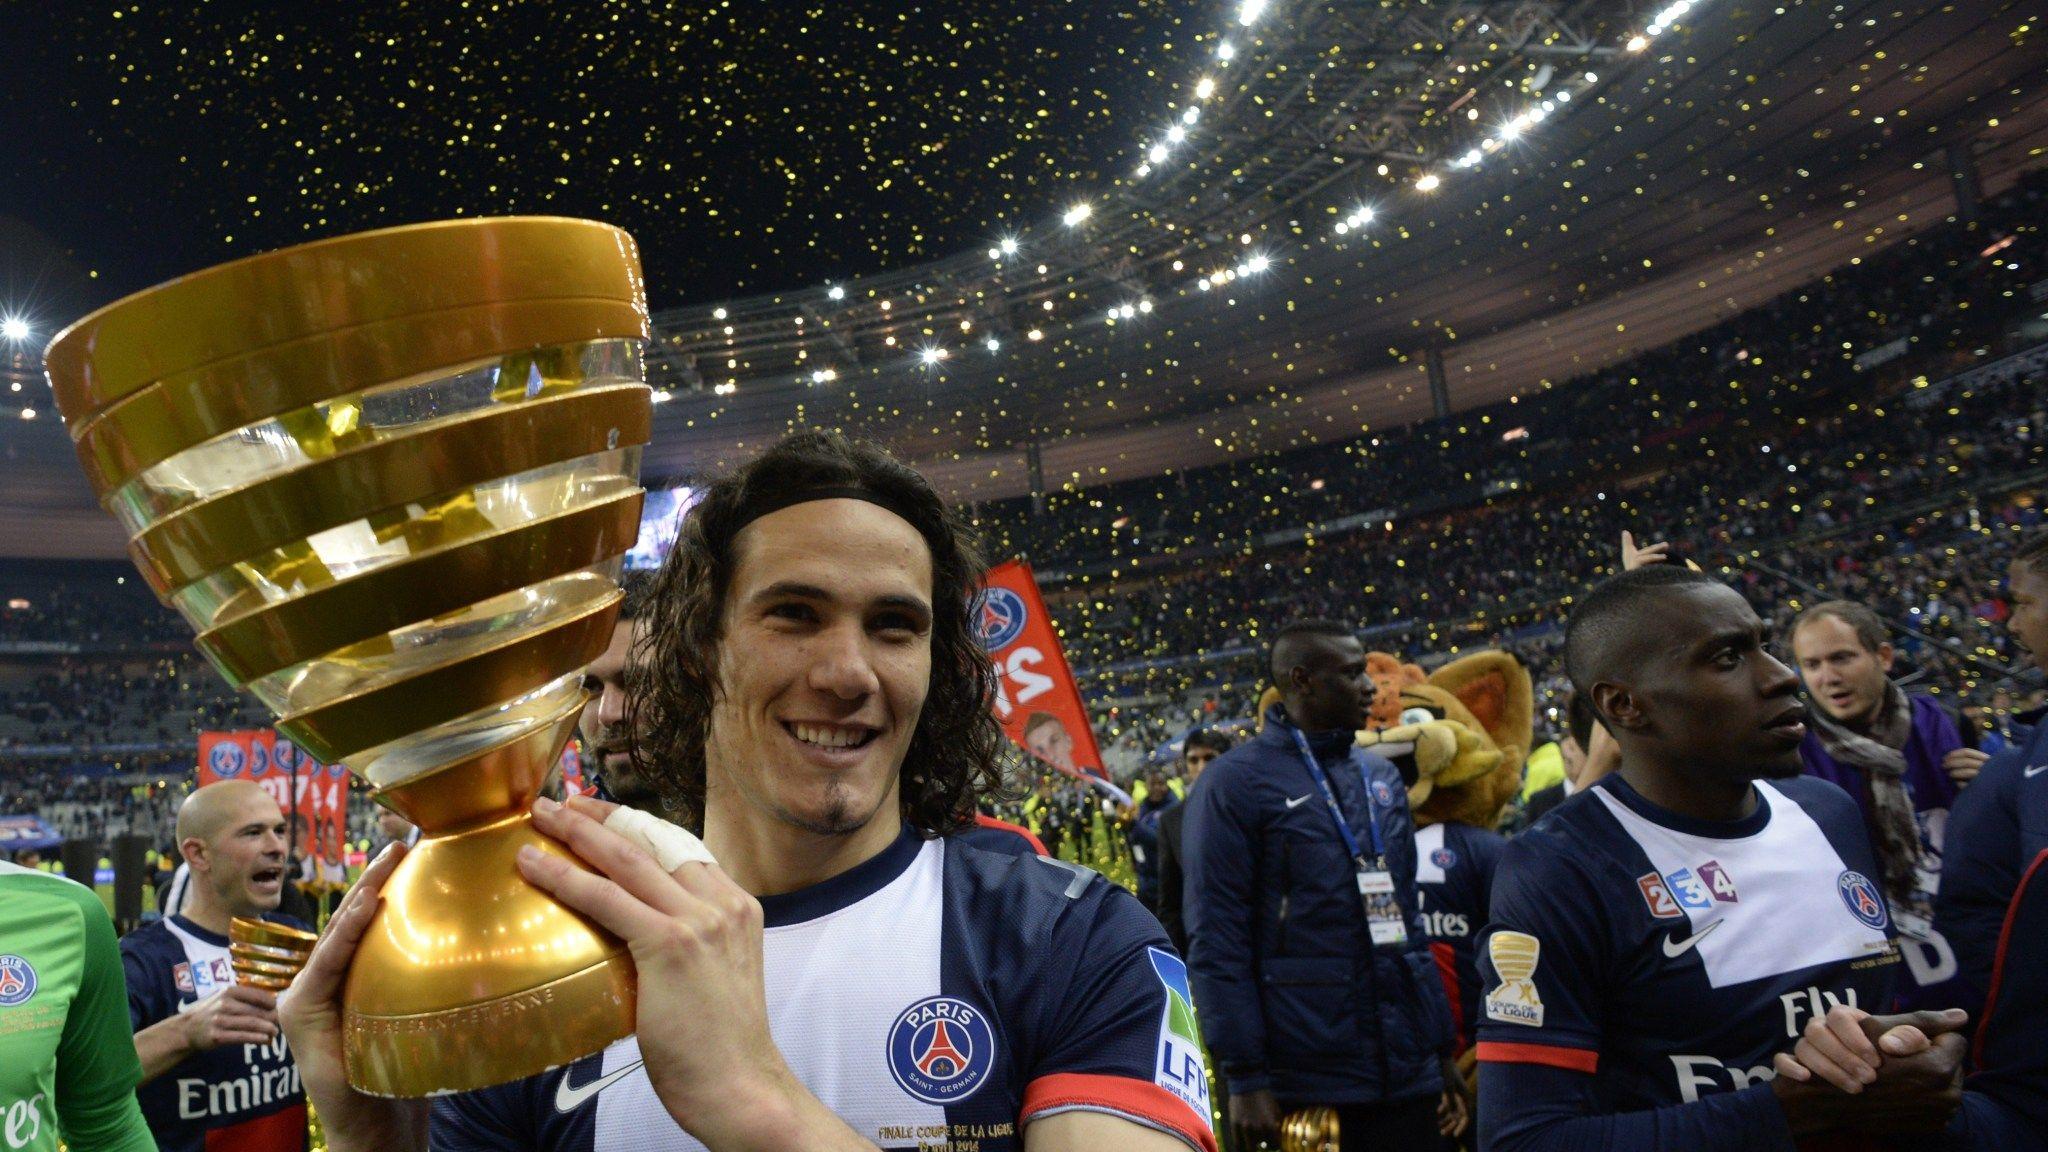 Coupe De La Ligue Edinson Cavani Inspires Paris Saint Germain To 2 1 Cup Win Over Lyon Football News Sky Sports